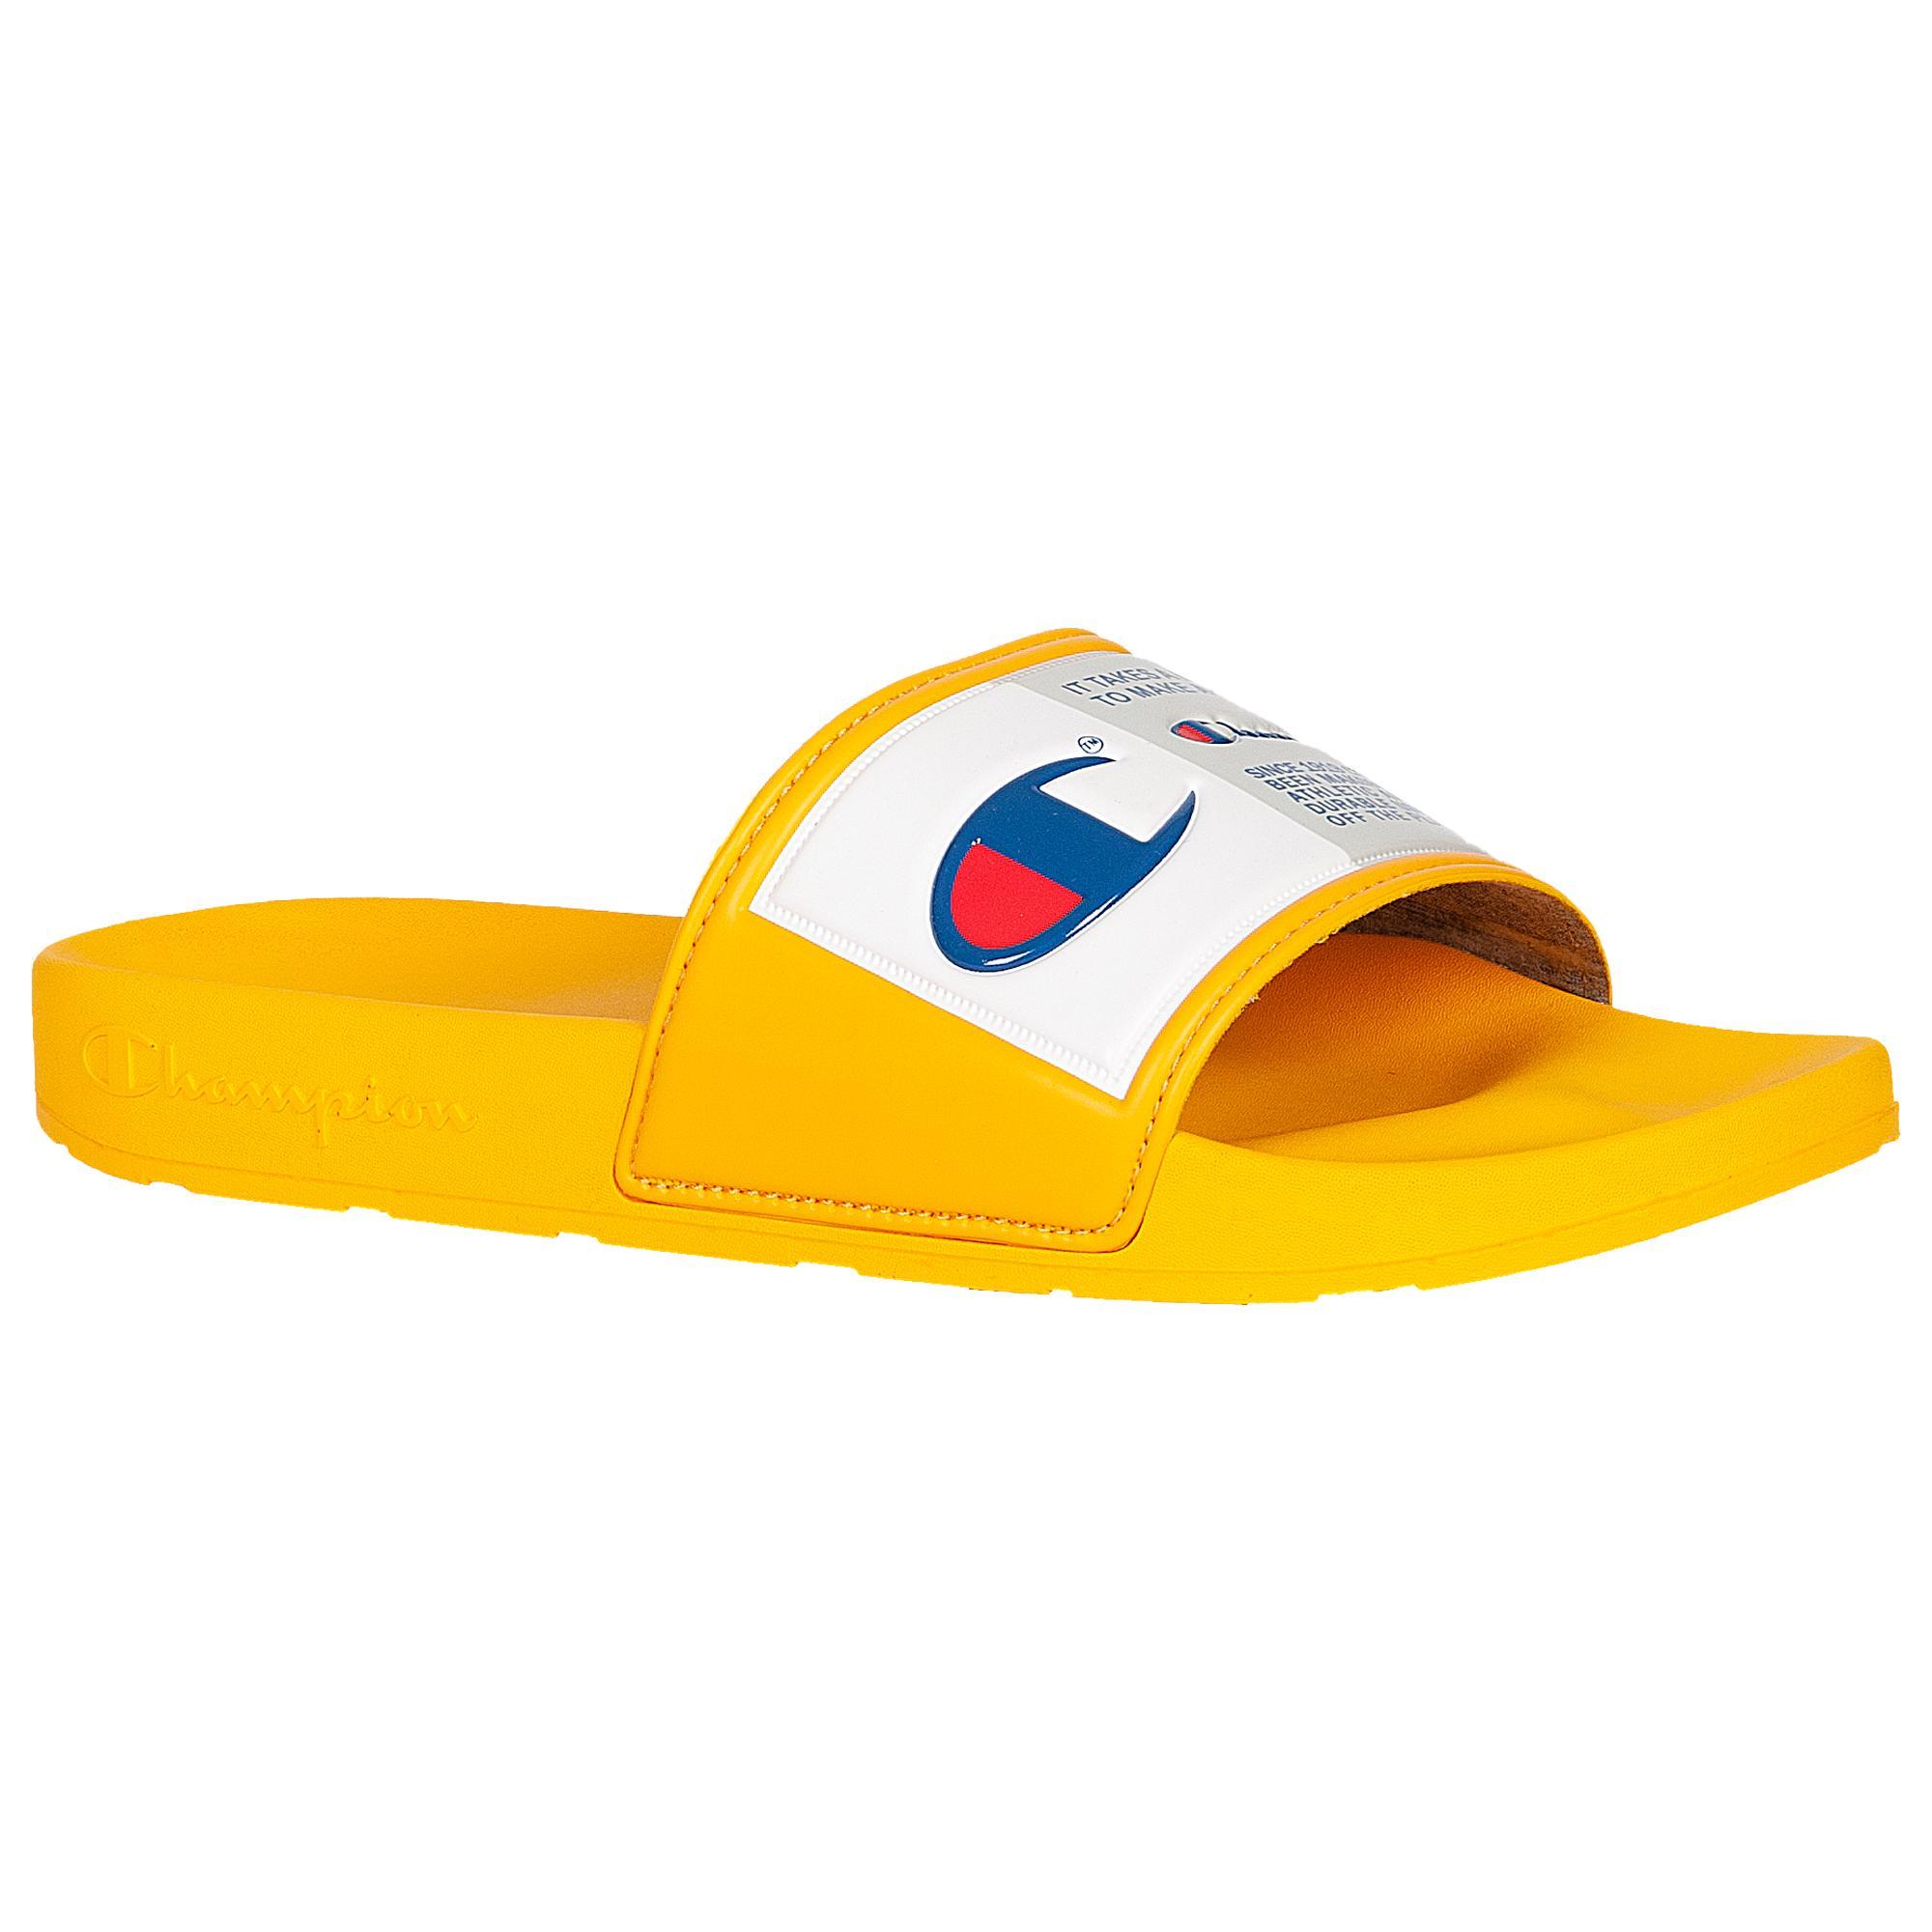 Champion Ipo Jock Slides in Gold/White